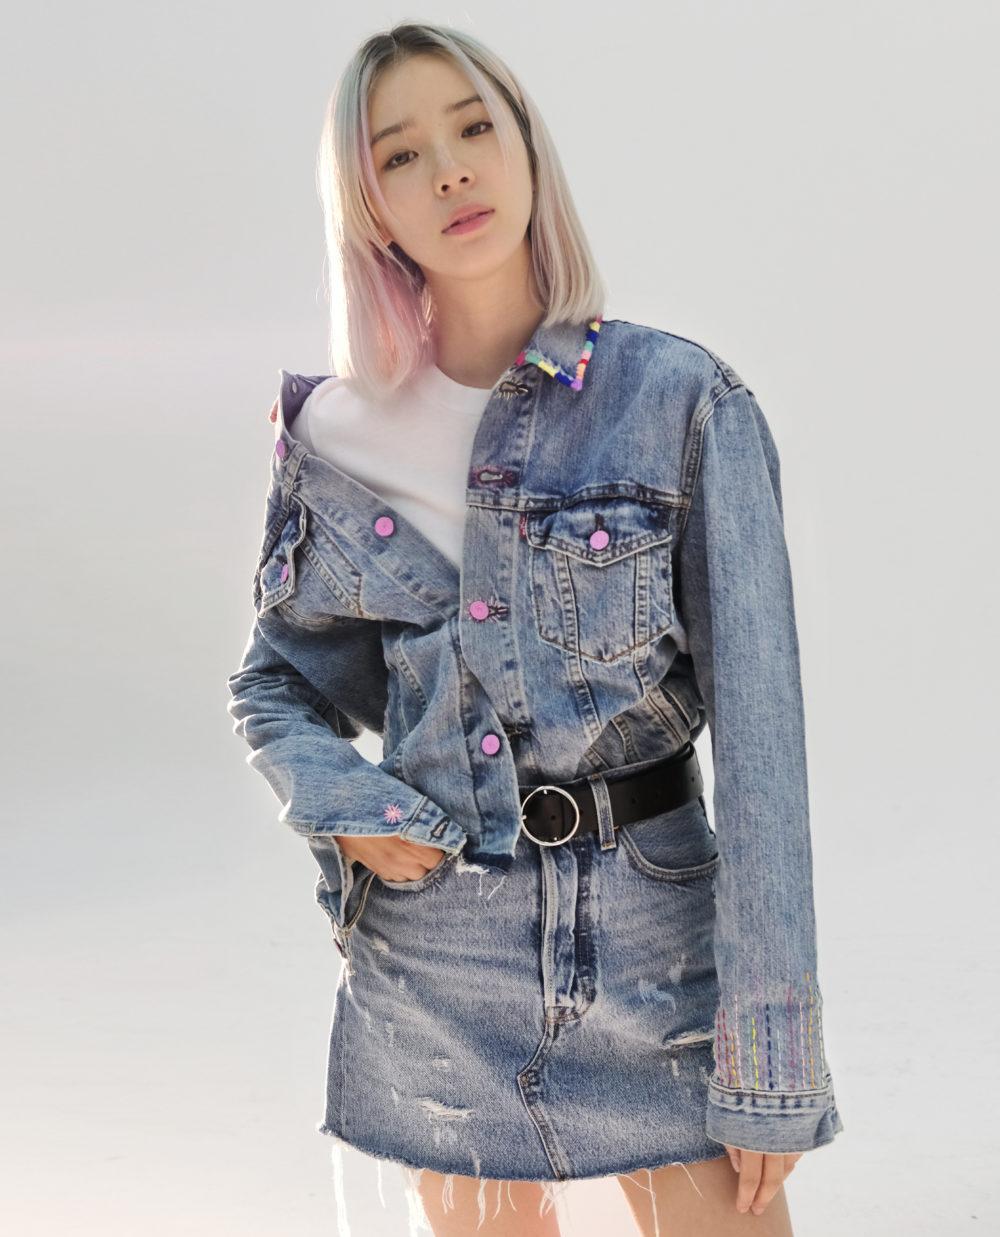 Irene-Kim-e1507237805682.jpg